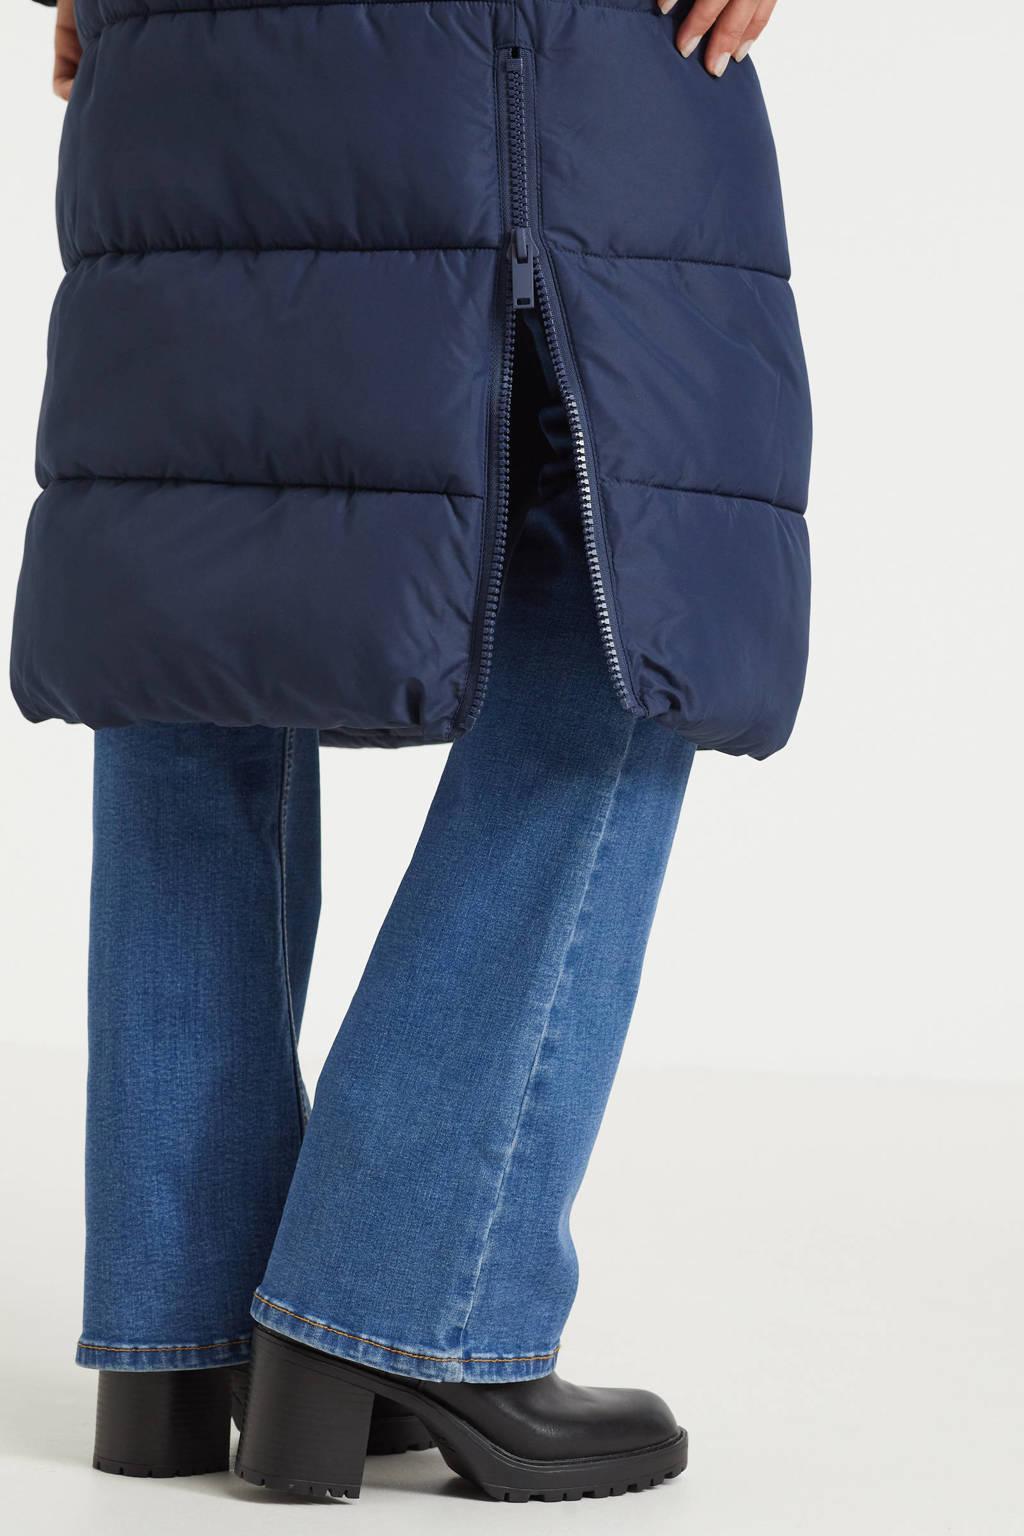 anytime gewatteerde jas donkerblauw, Donkerblauw